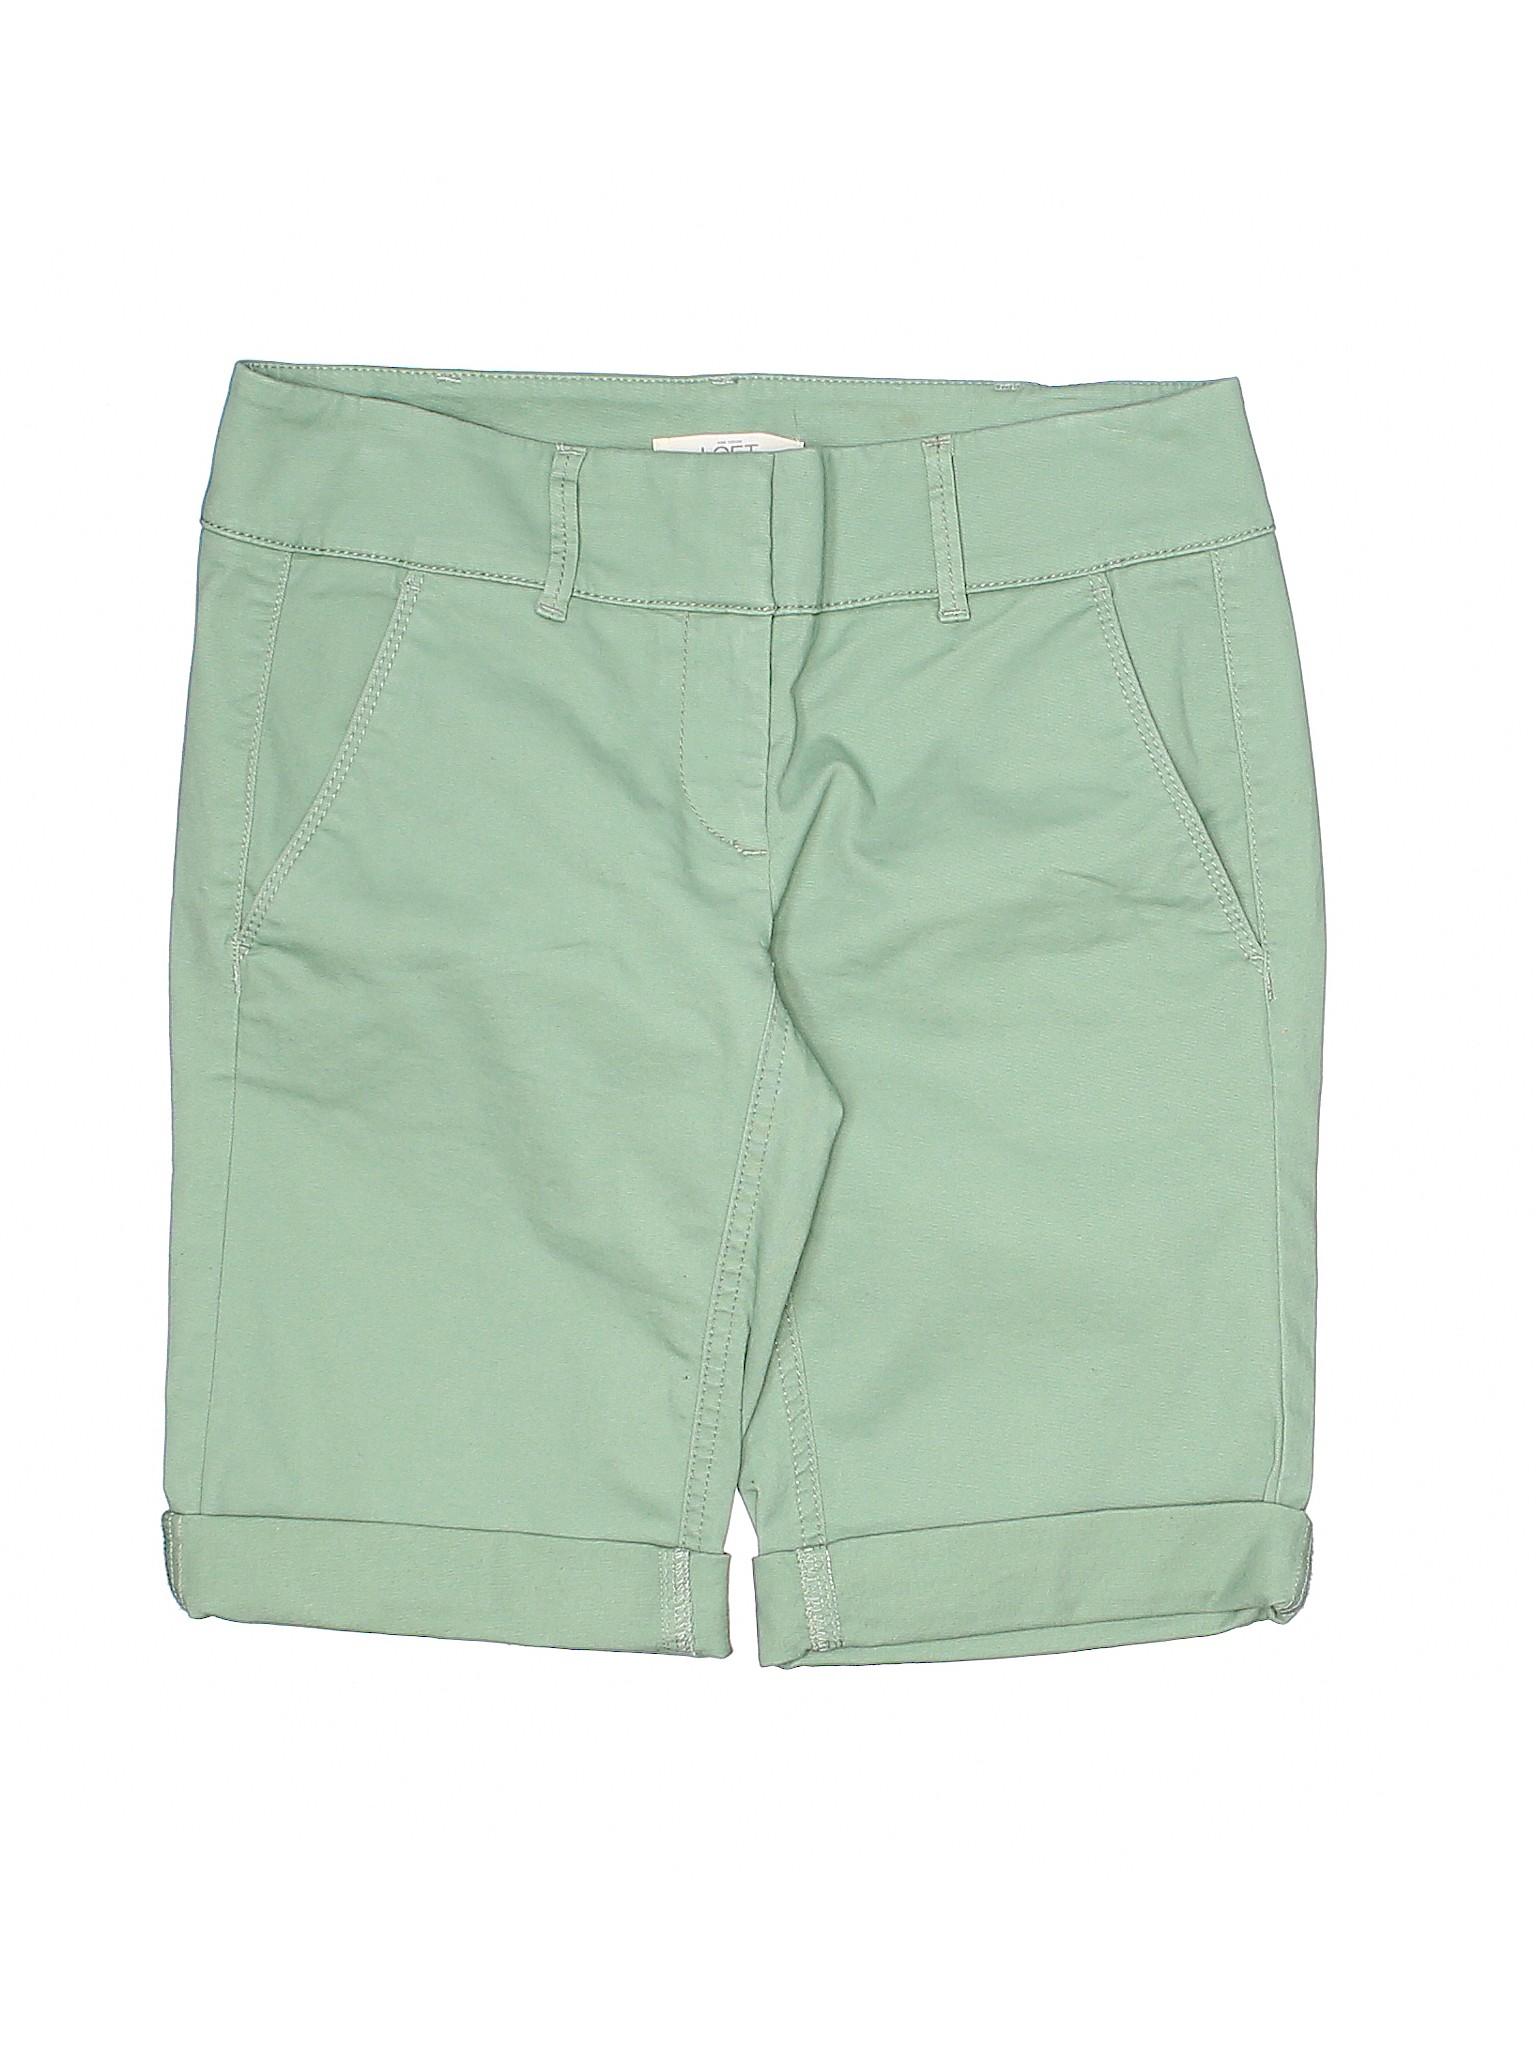 Boutique Shorts LOFT Khaki Ann Taylor rqwvpra